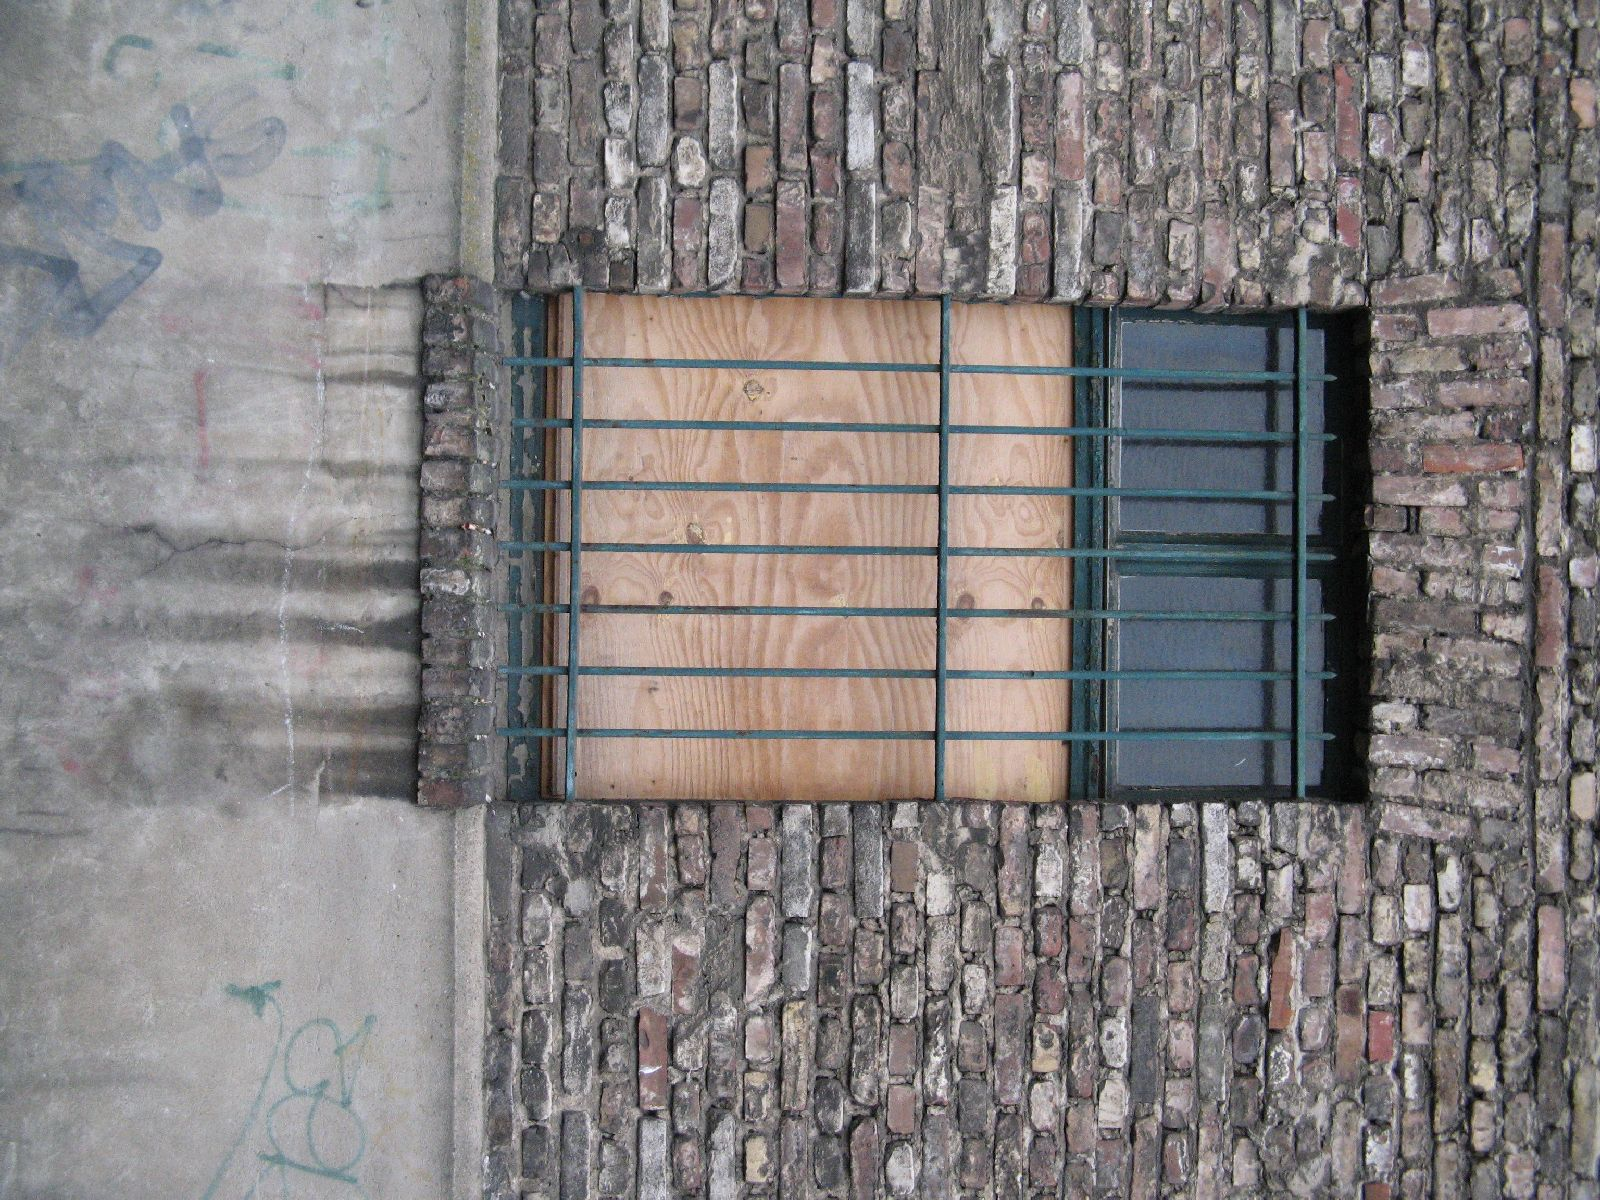 Building_Texture_B_4265